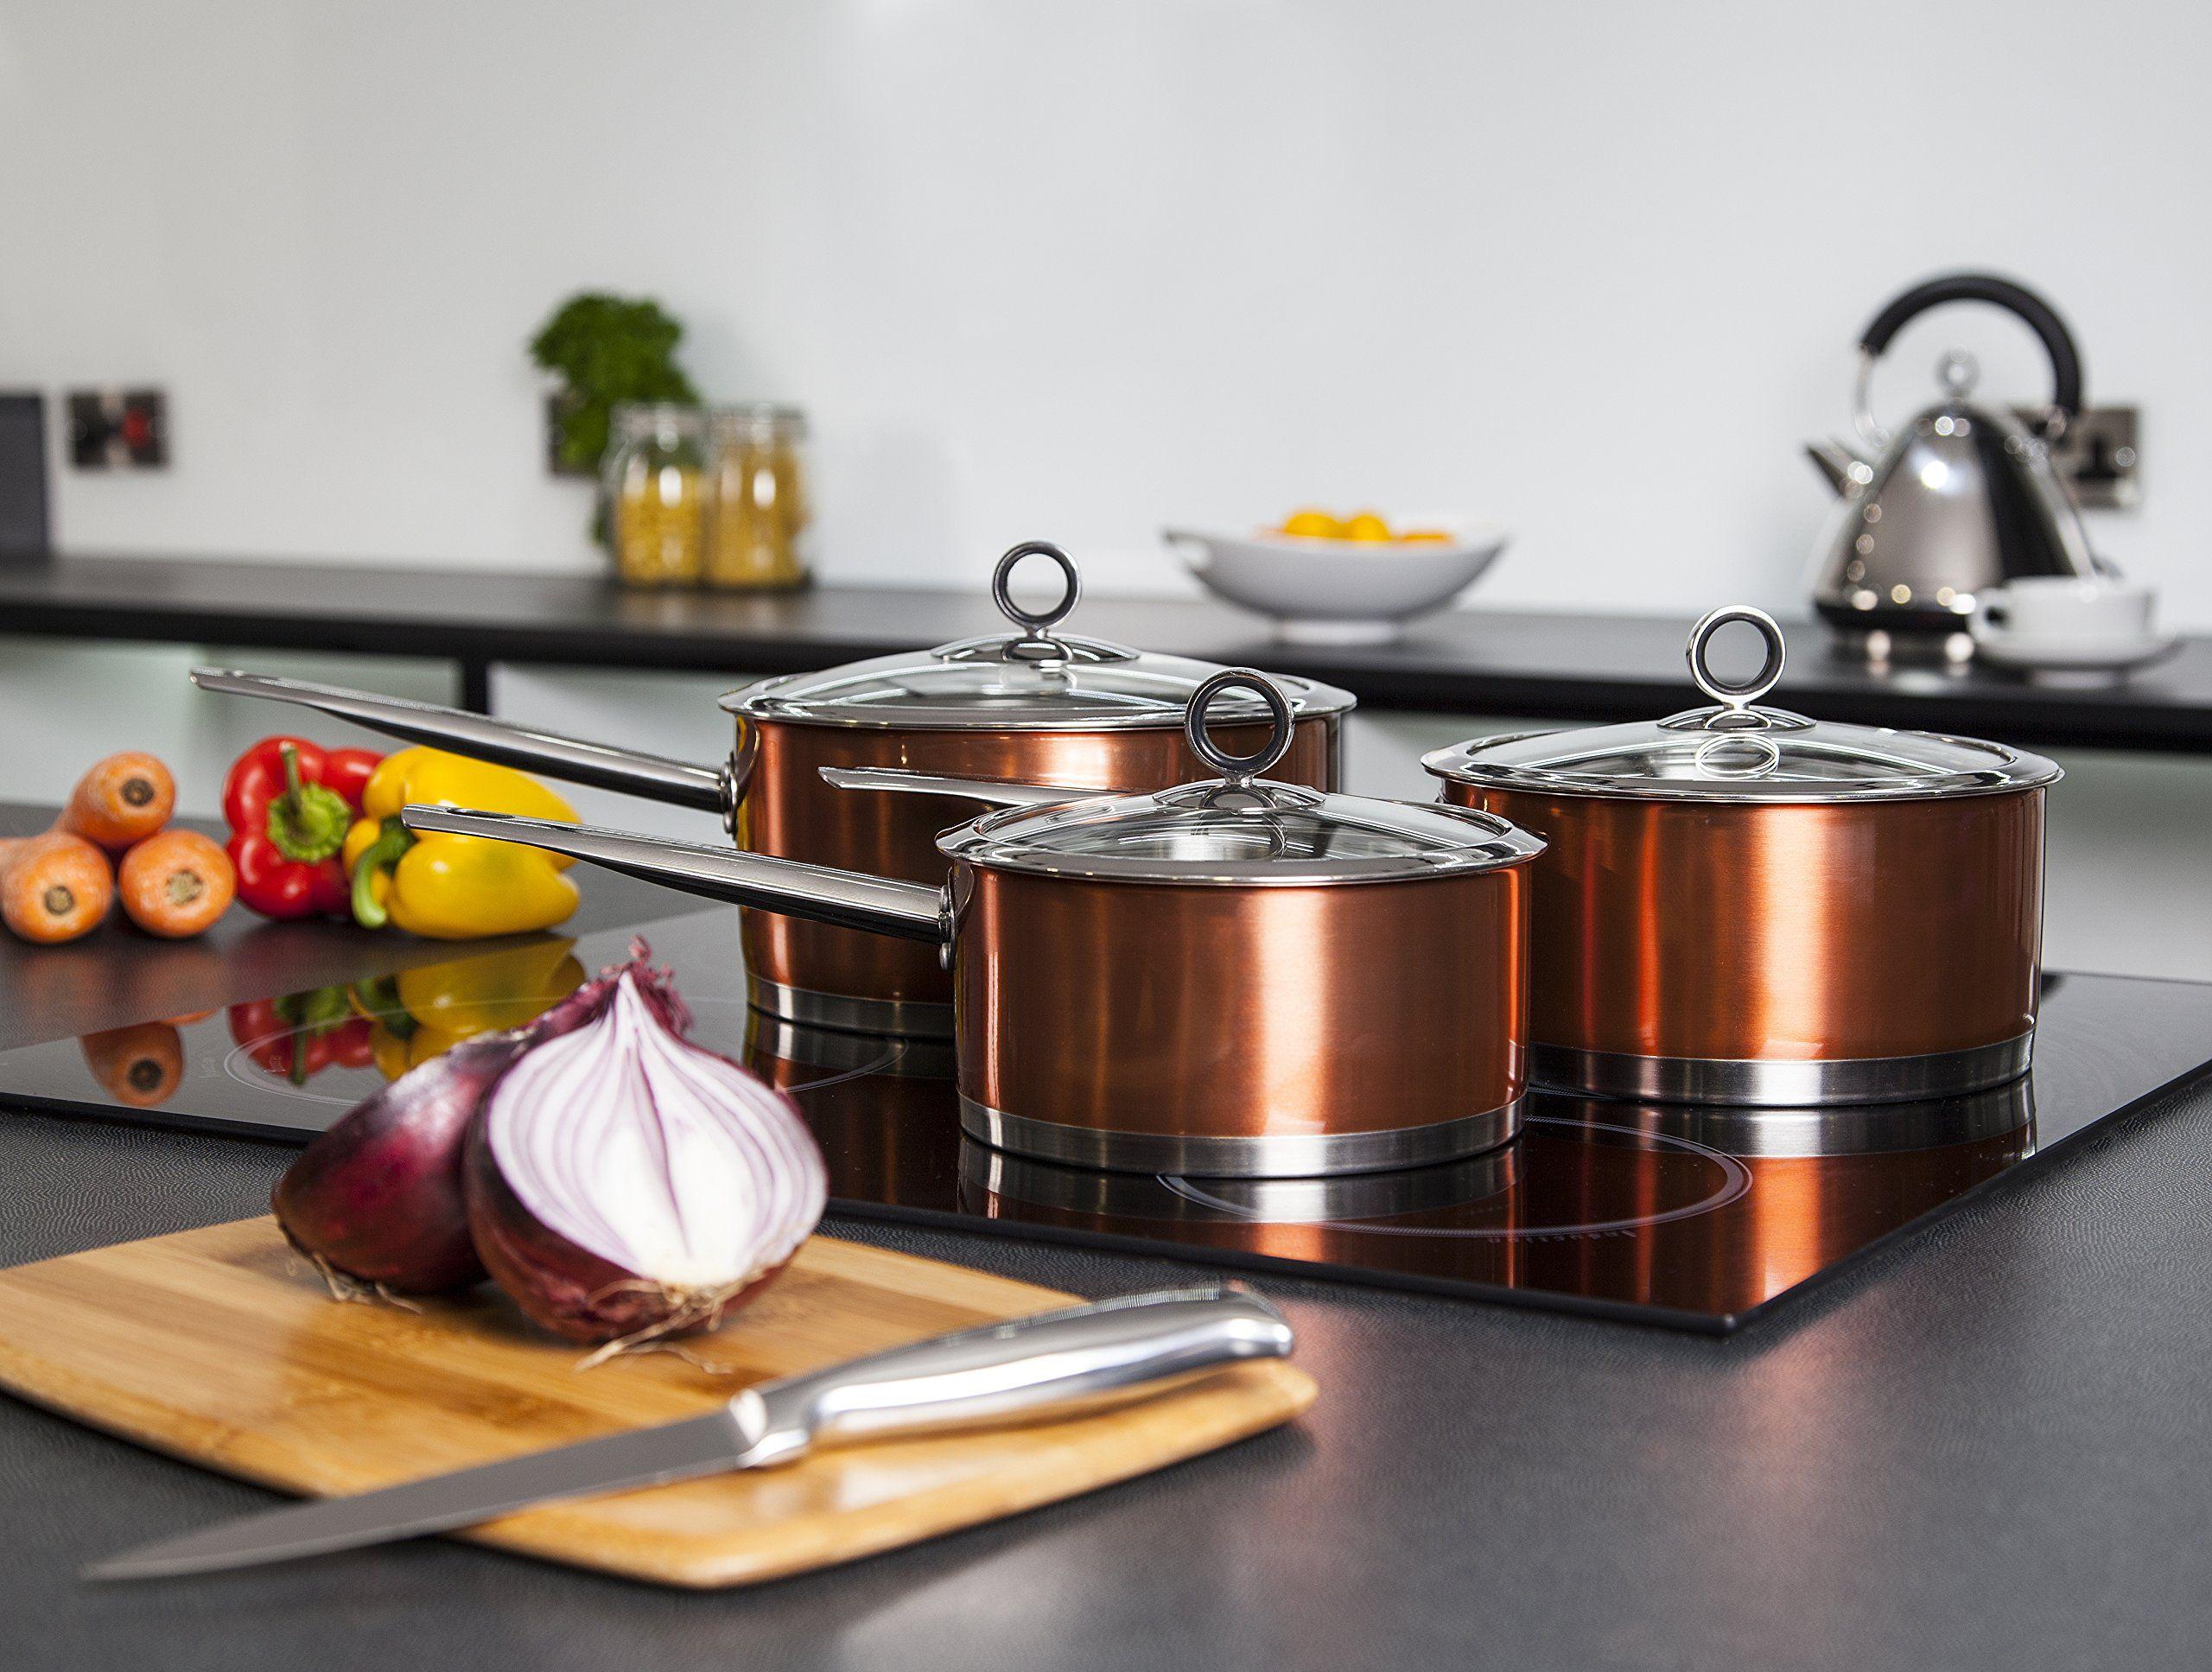 Morphy Richards 46394 3-Piece Accents Copper Pan Set: Amazon.co.uk: Kitchen & Home